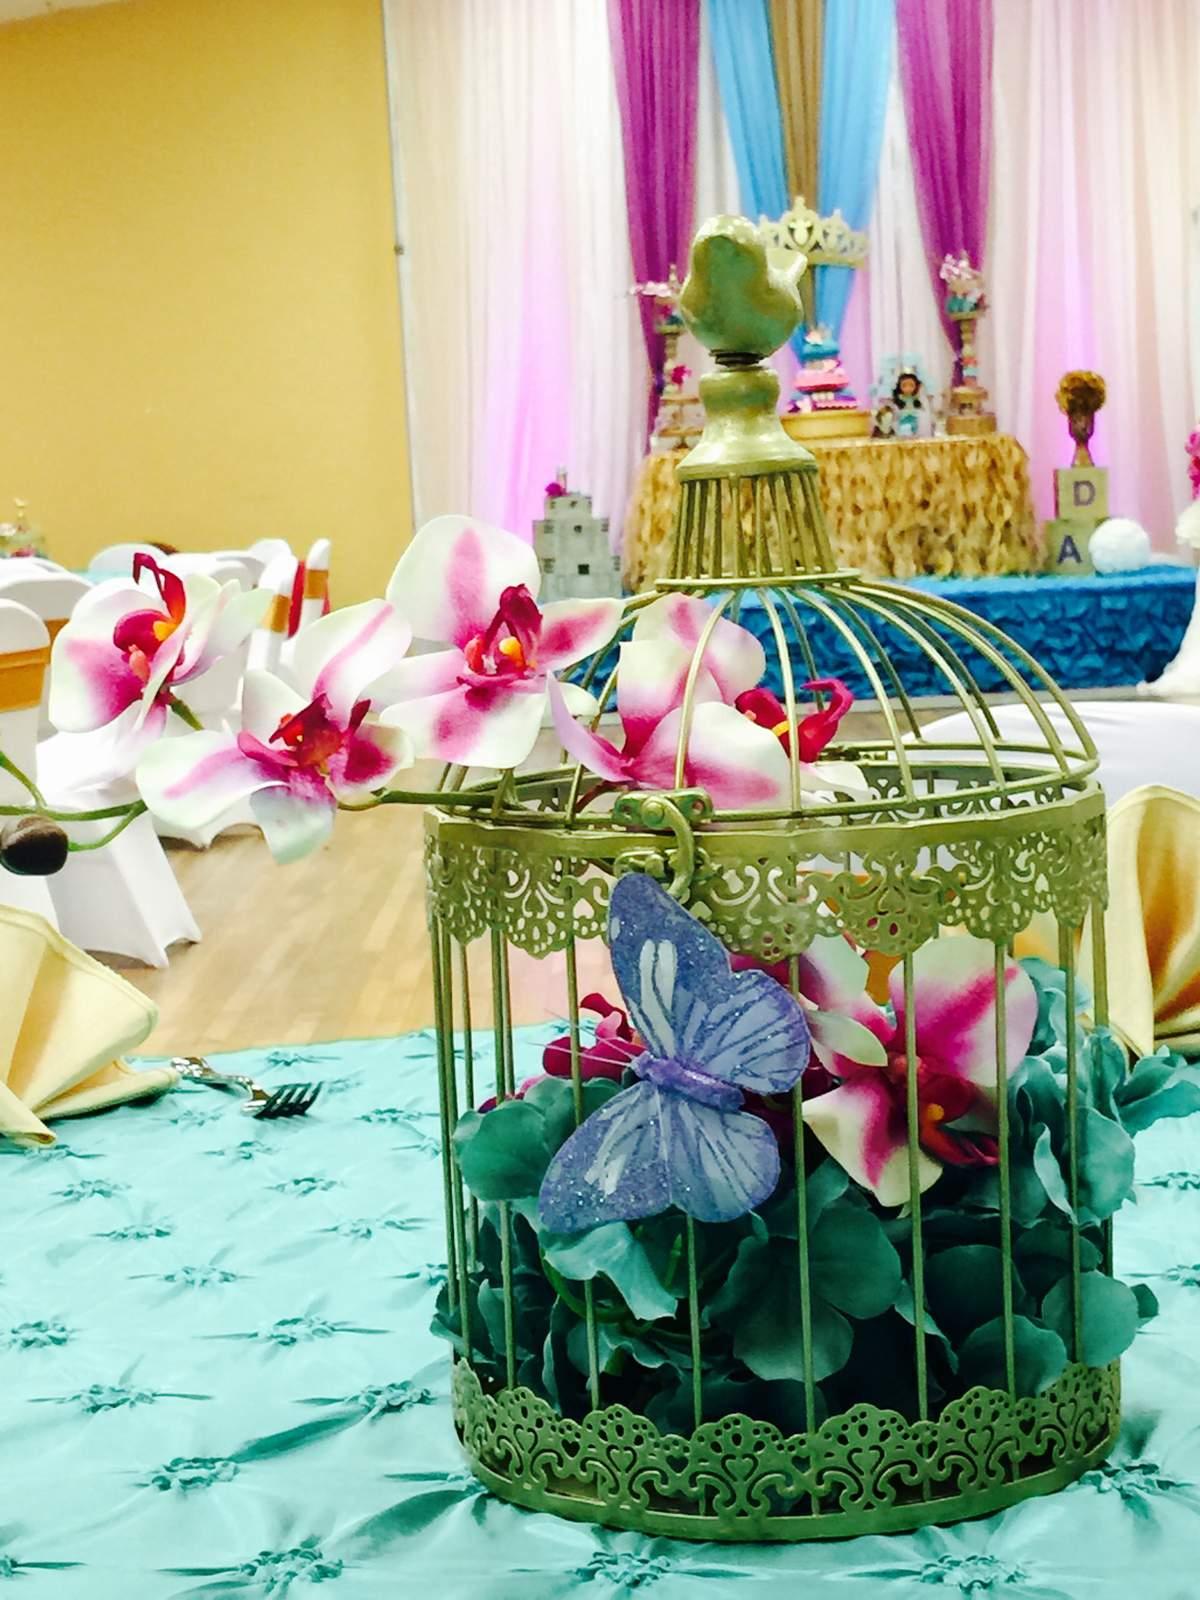 Princess Jasmine (Aladdin) Baby Shower Party Ideas Photo 1 of 25